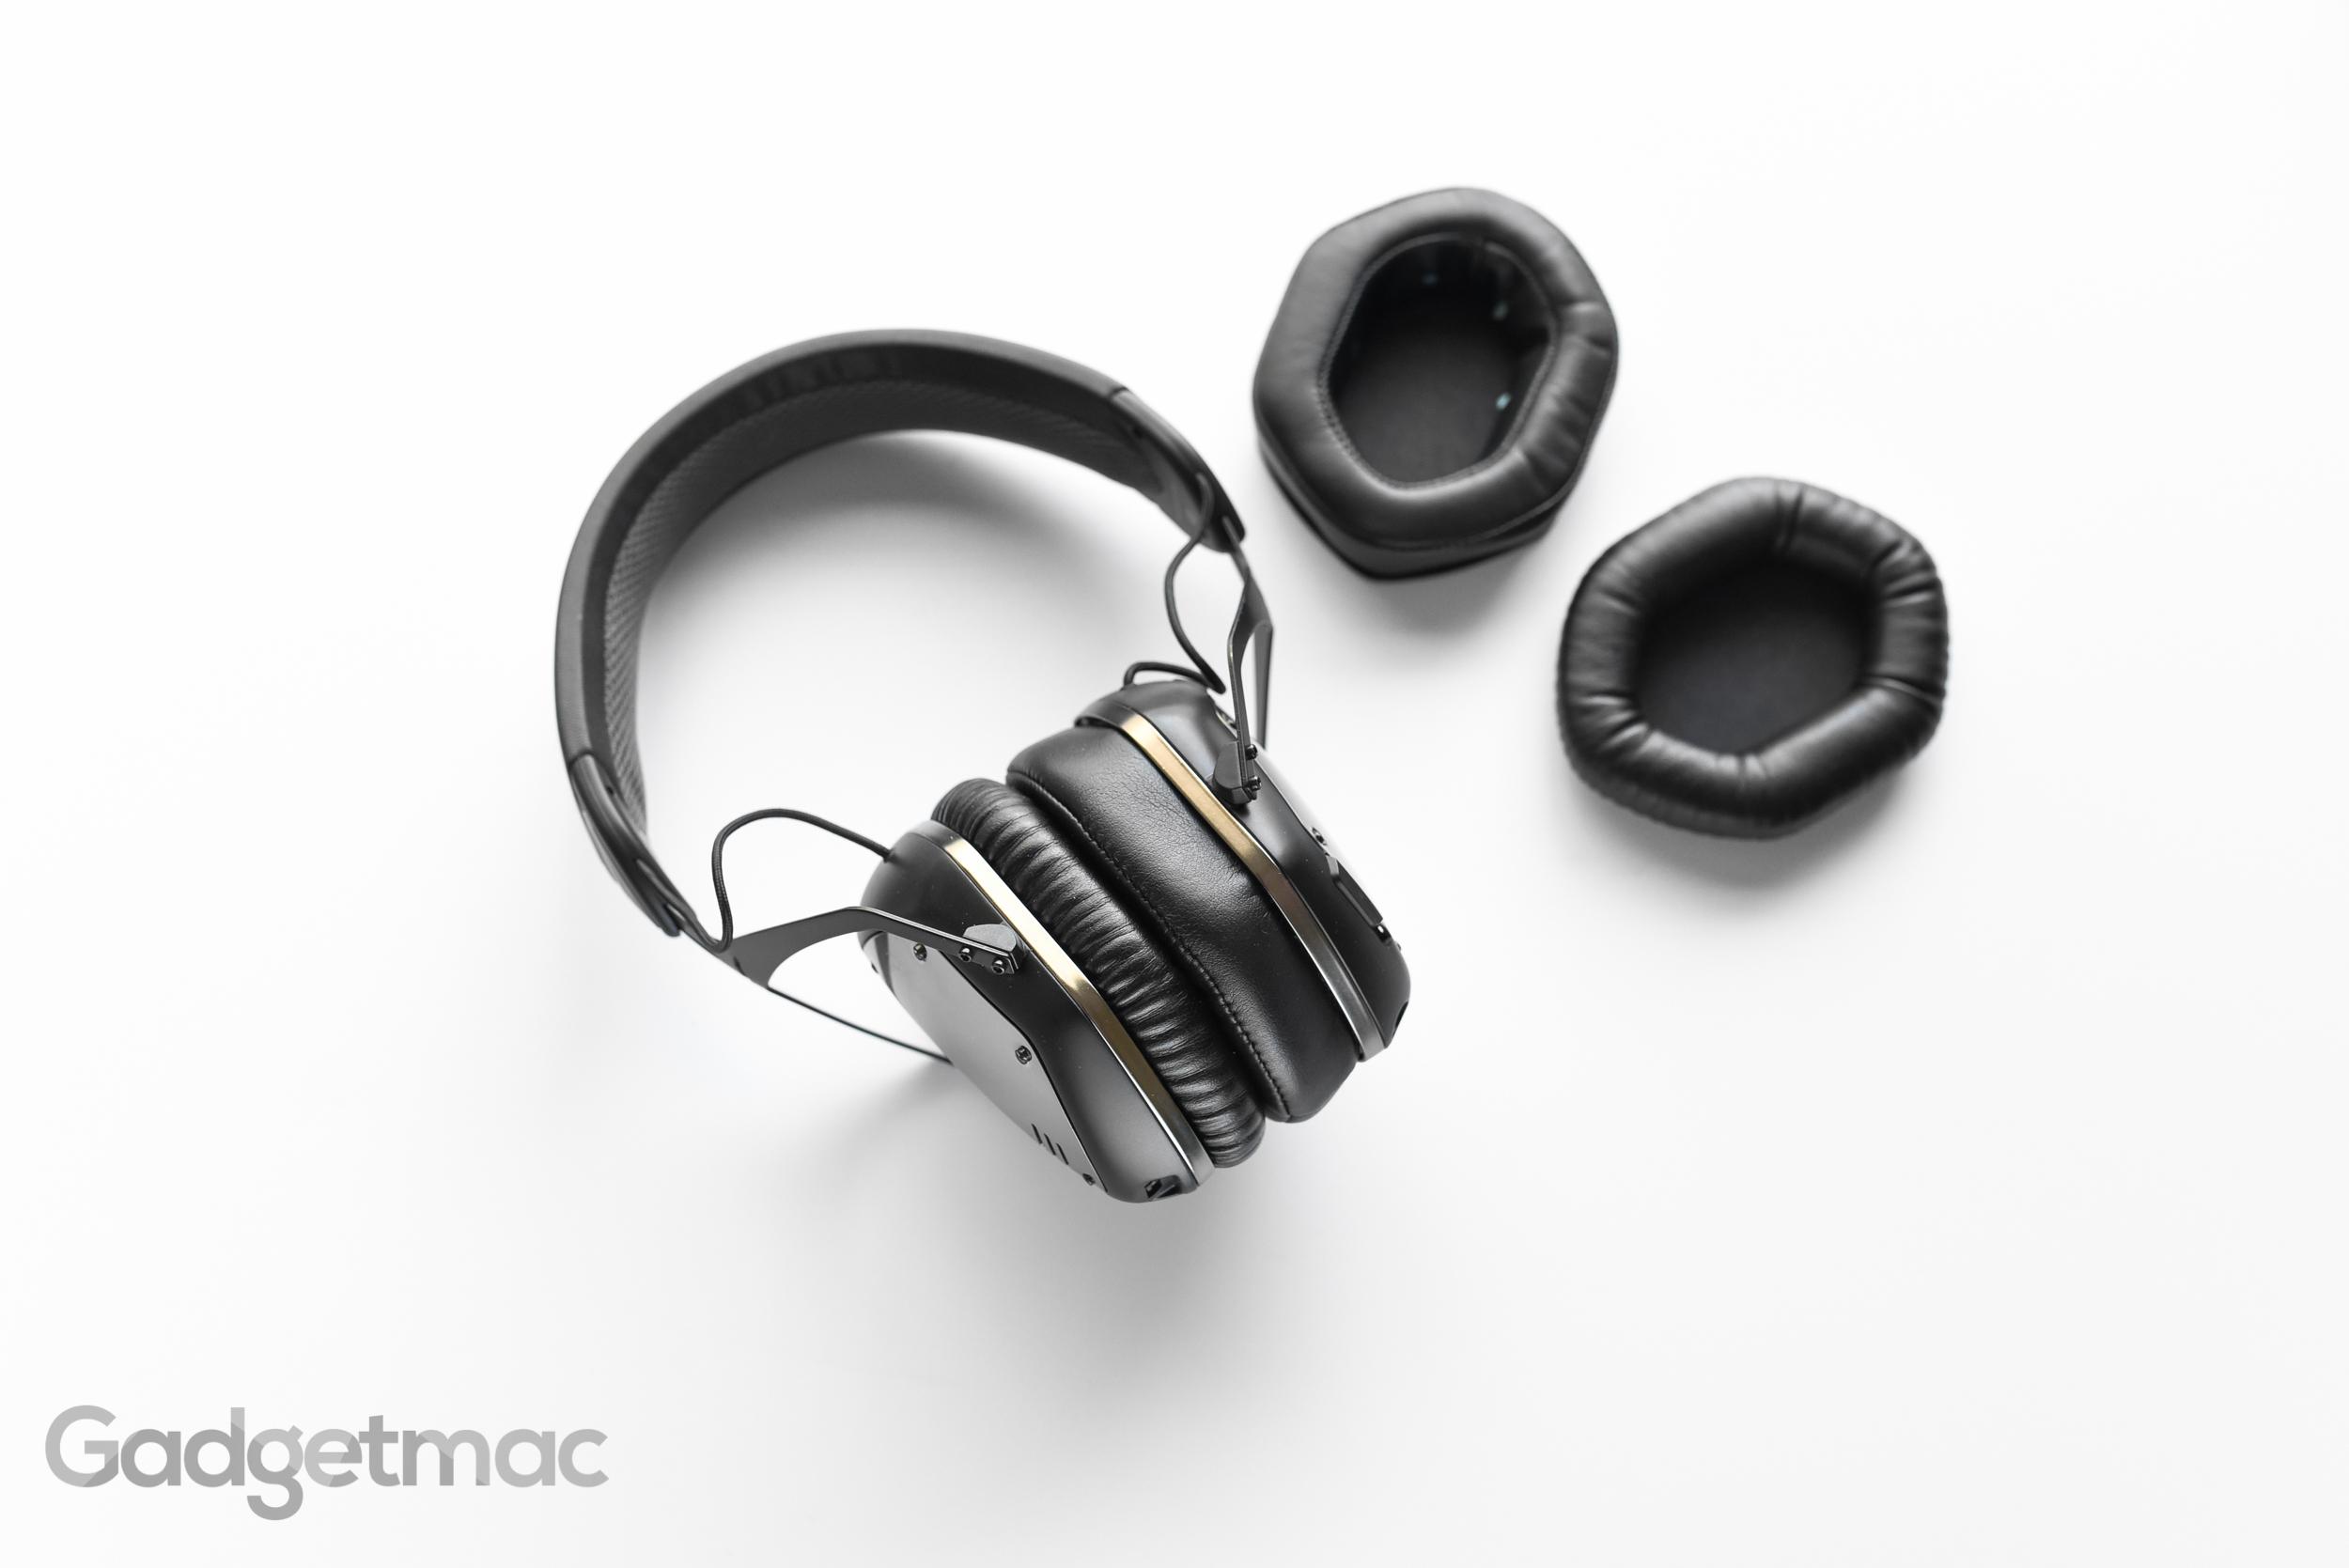 v-moda-crossfade-wireless-headphones-xl-memory-cushions-upgrade.jpg